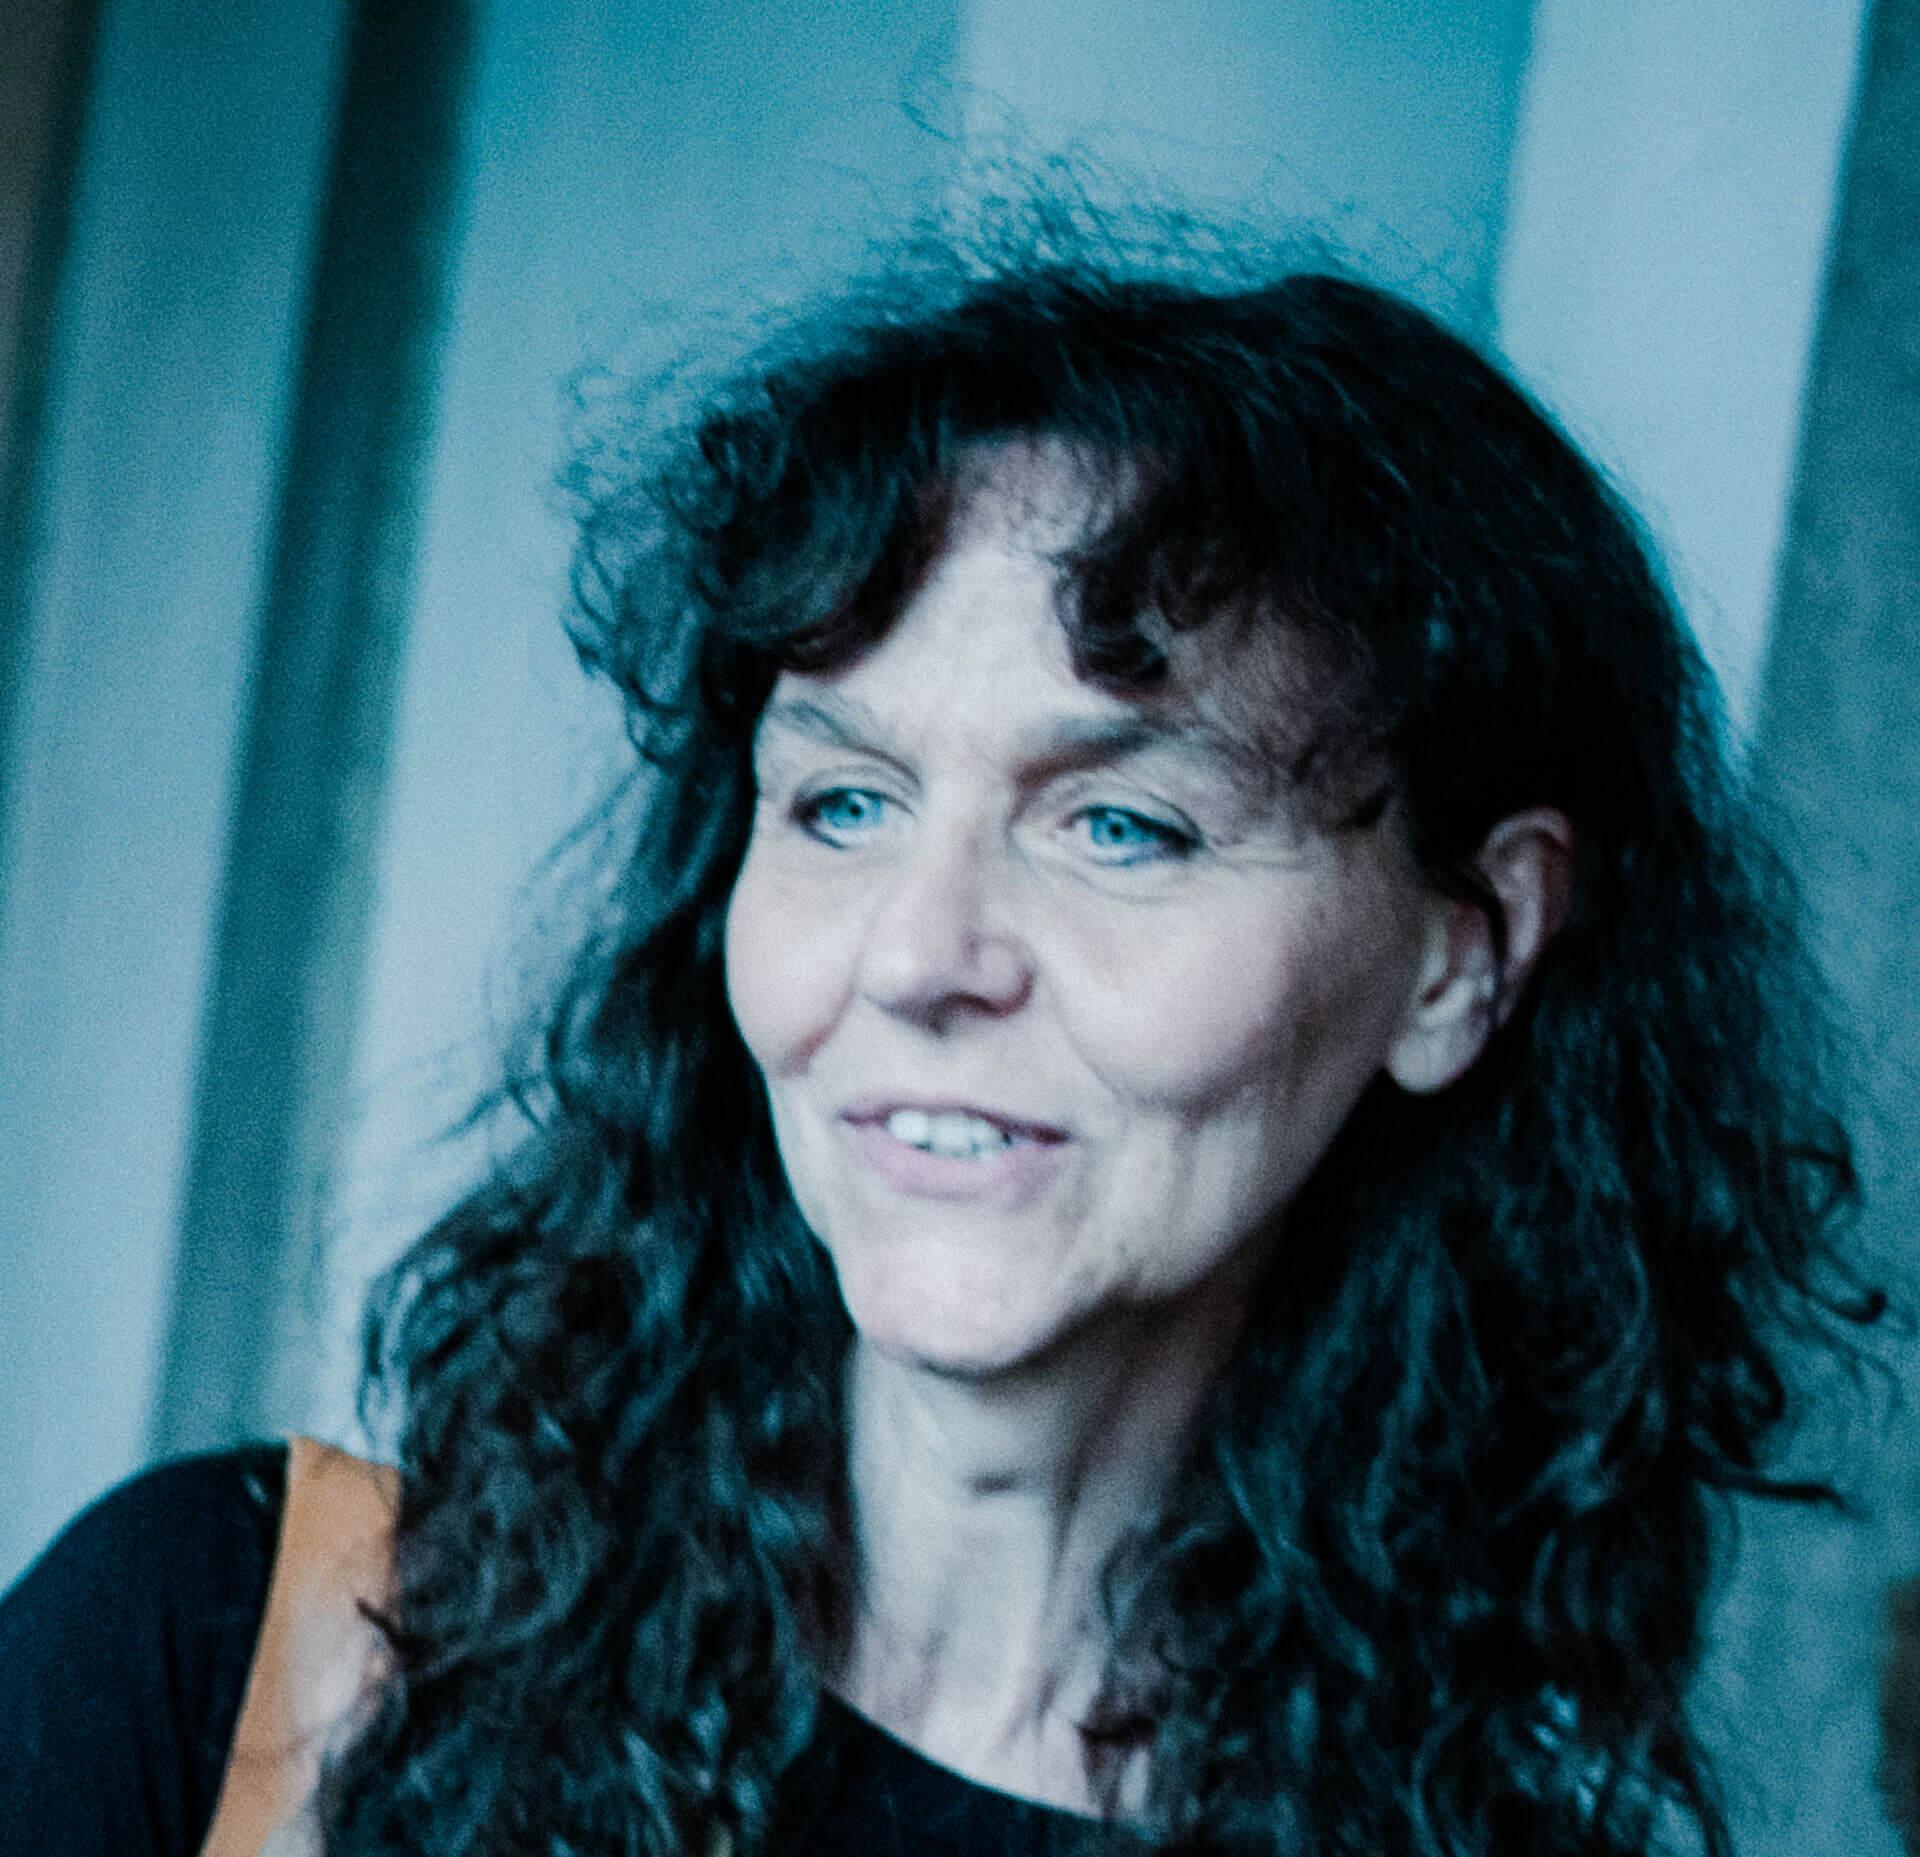 Cristina Ciconali